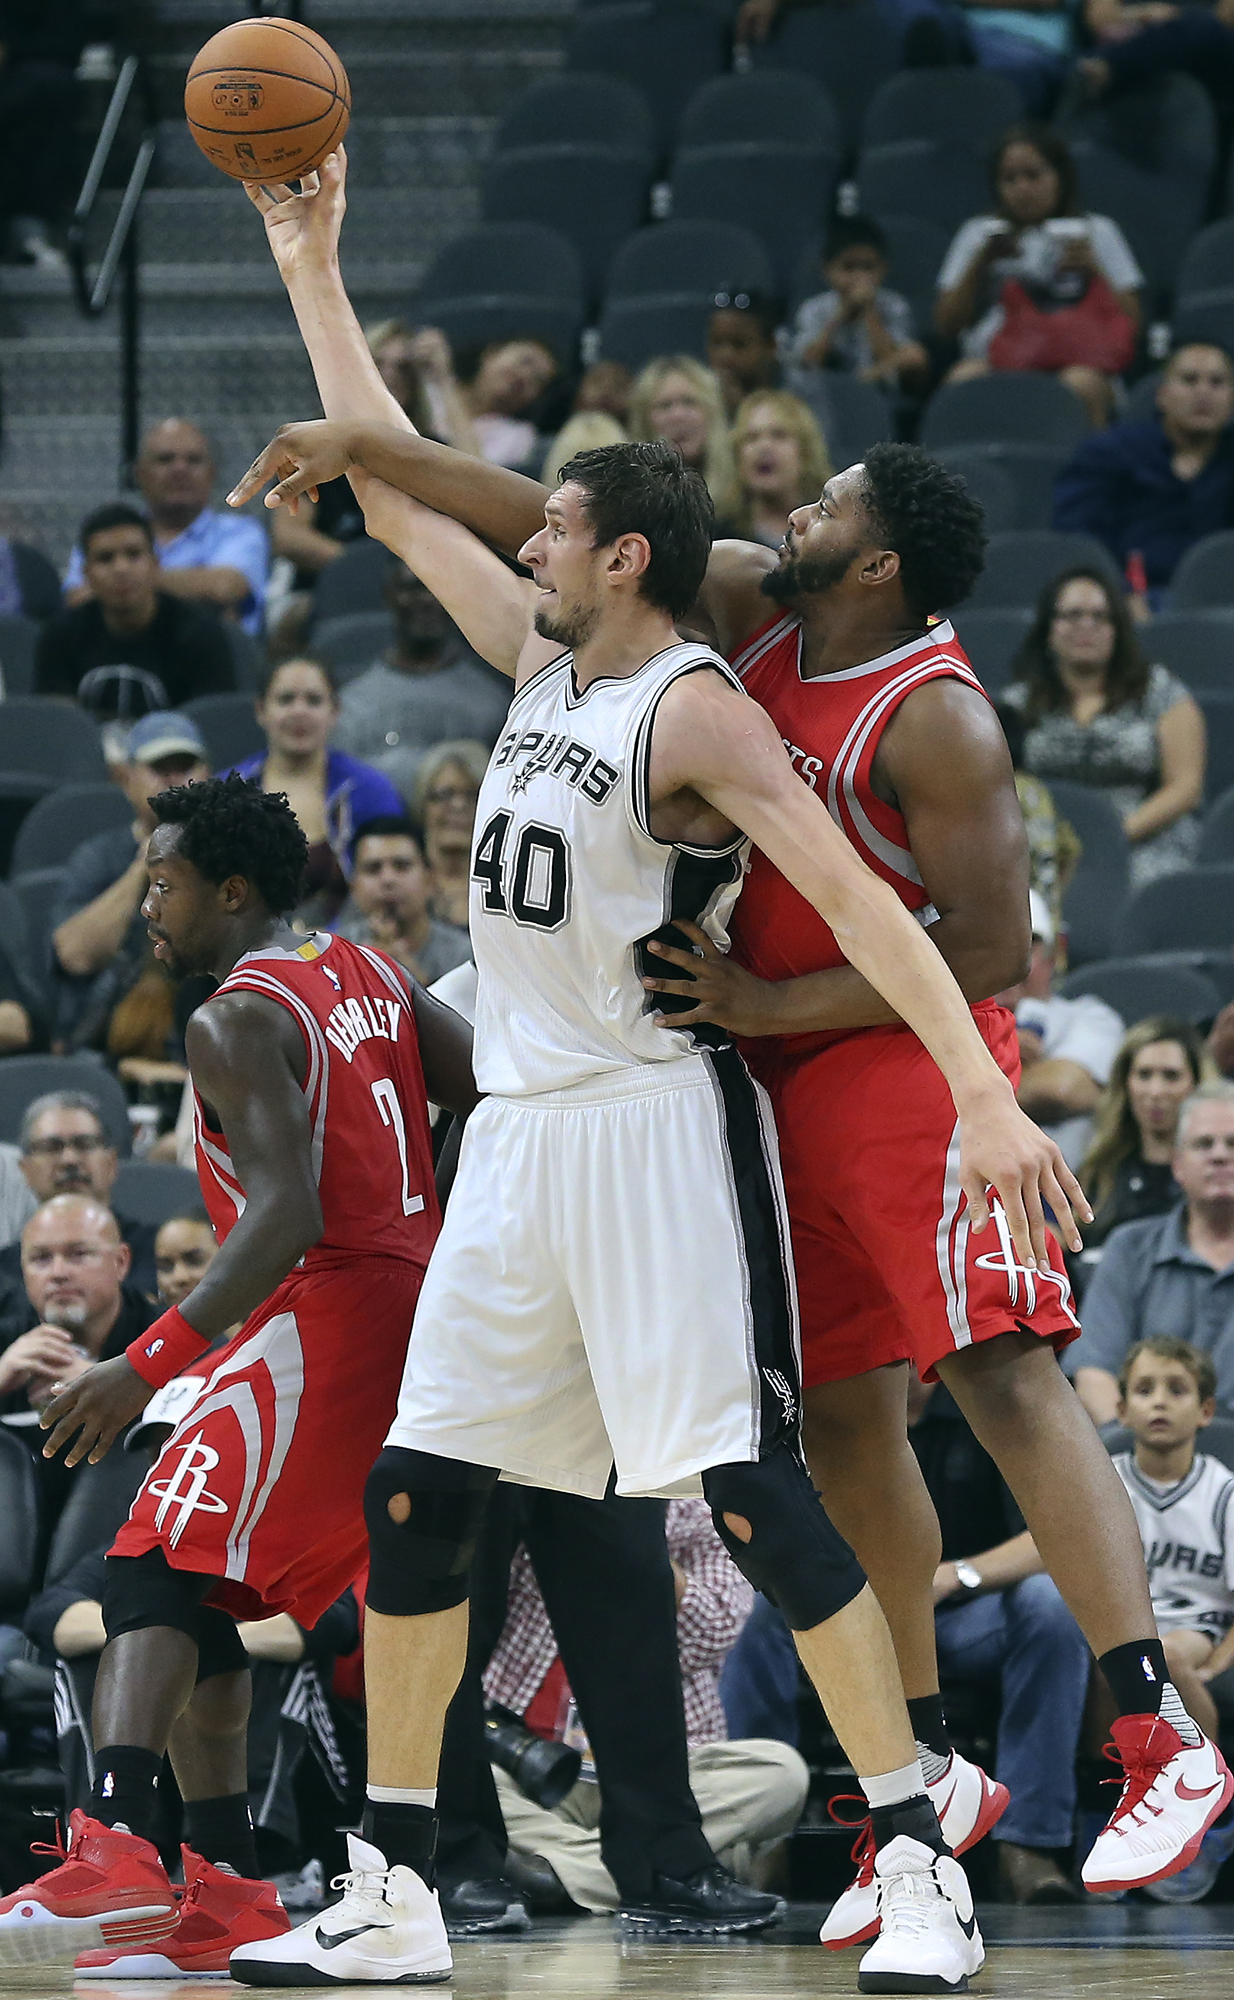 Dallas Power Sports >> Boban Marjanovic ruins rim, delays game with dunk - San Antonio Express-News